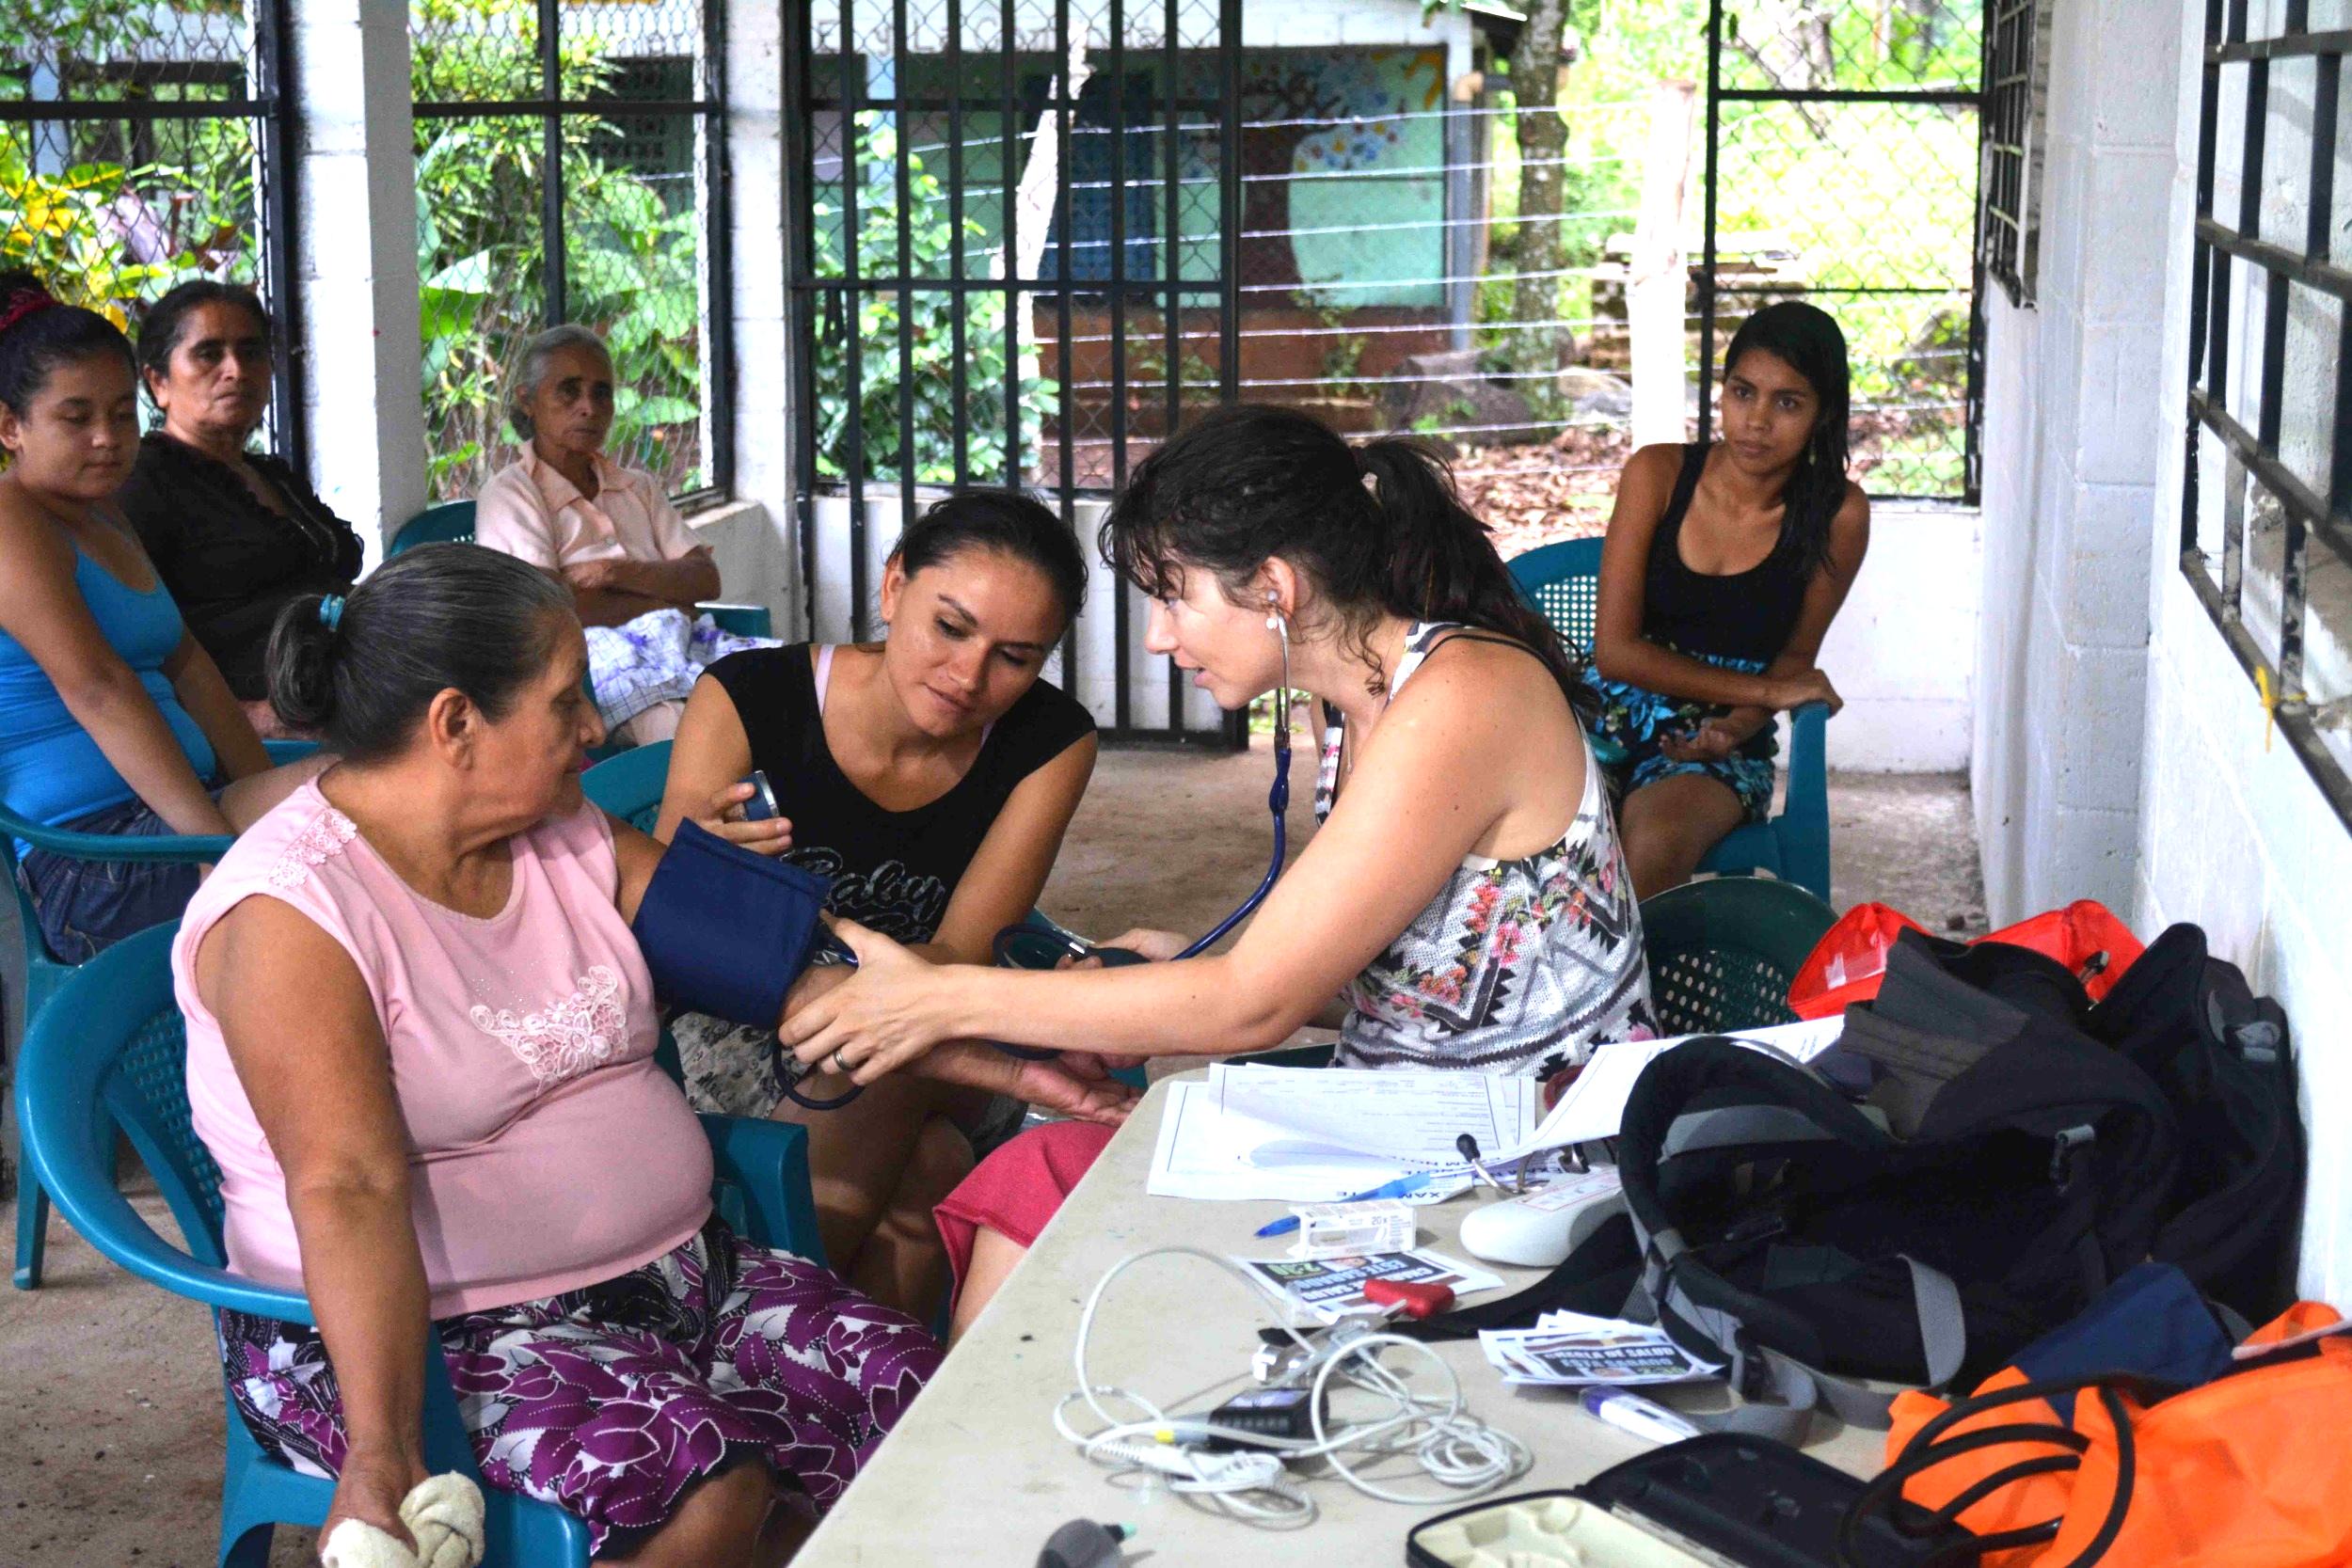 Nurse Practitioner Jaimee Arroyo hosts a medical clinic to survey the health of women in rural El Salvador.